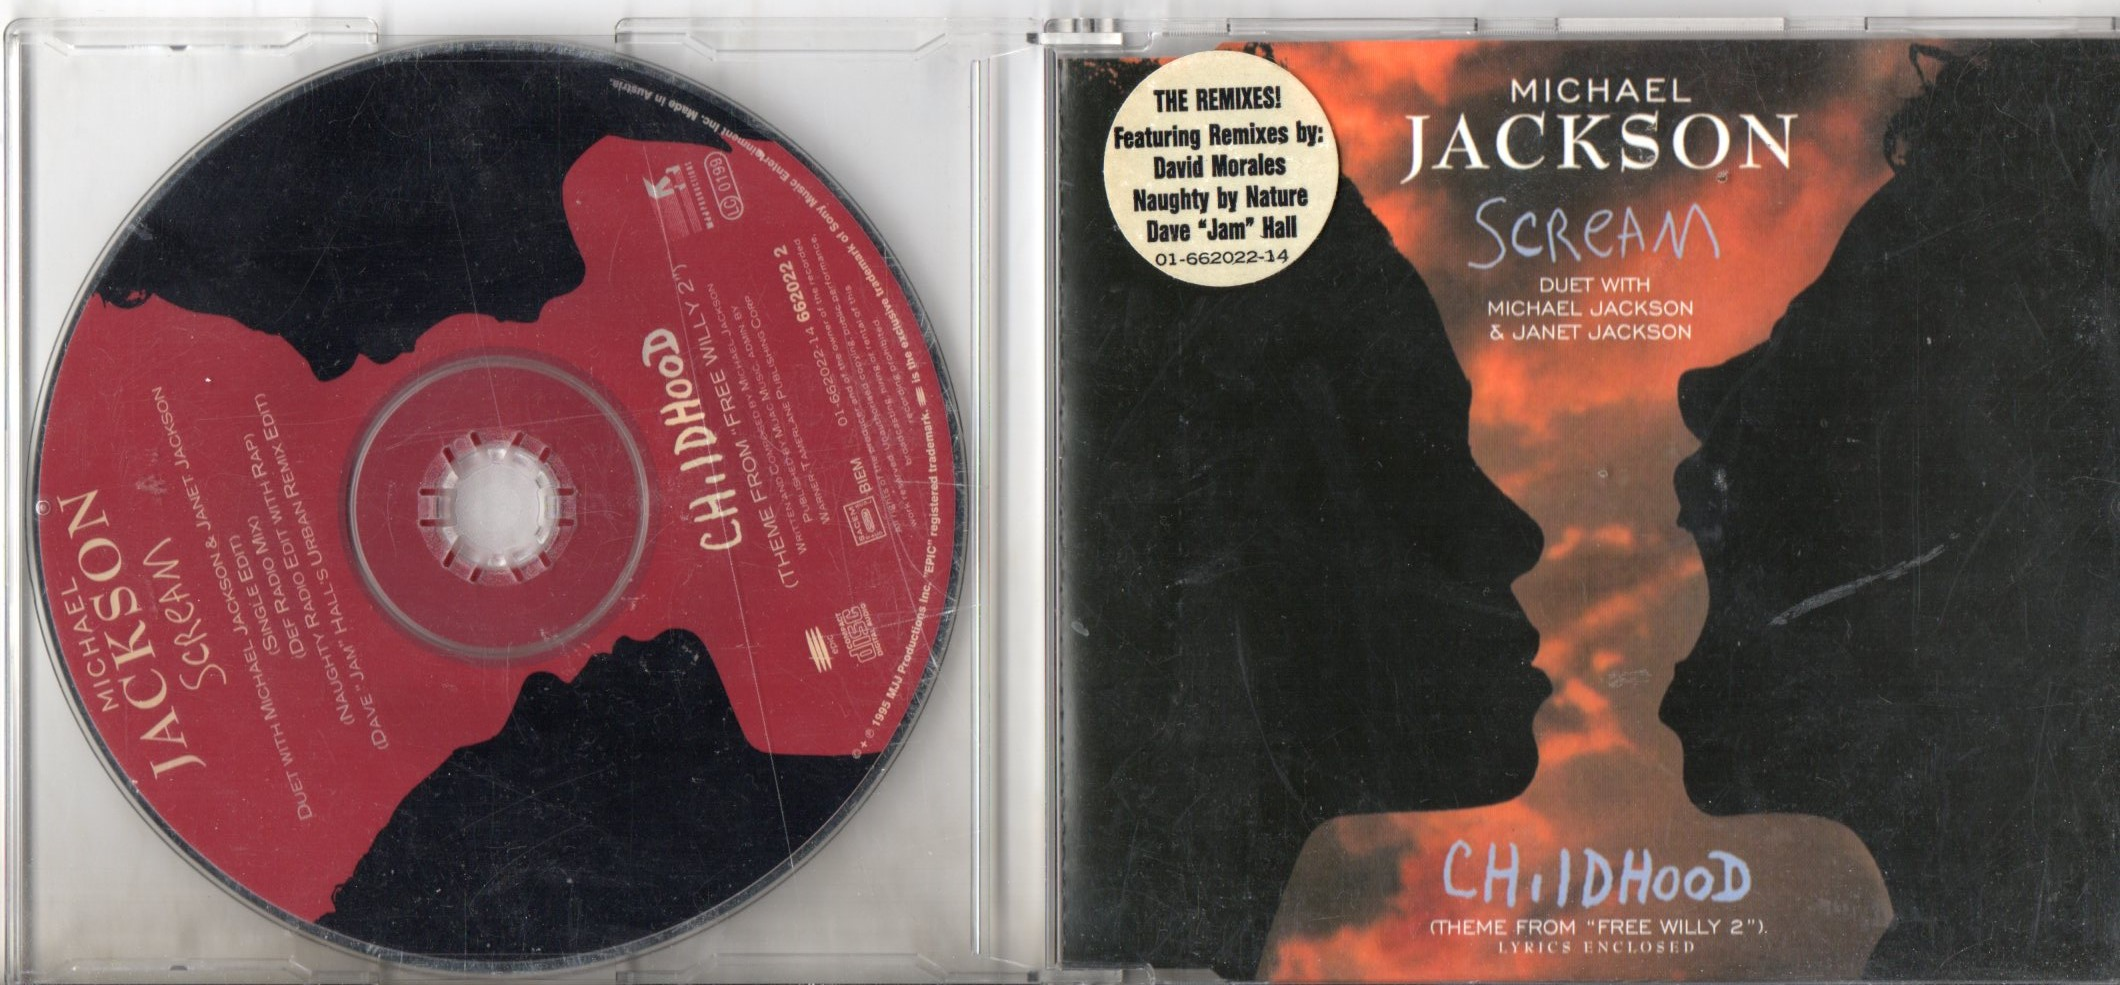 MICHAEL JACKSON & JANET JACKSON - Scream 5 tracks jewel case - CD Maxi